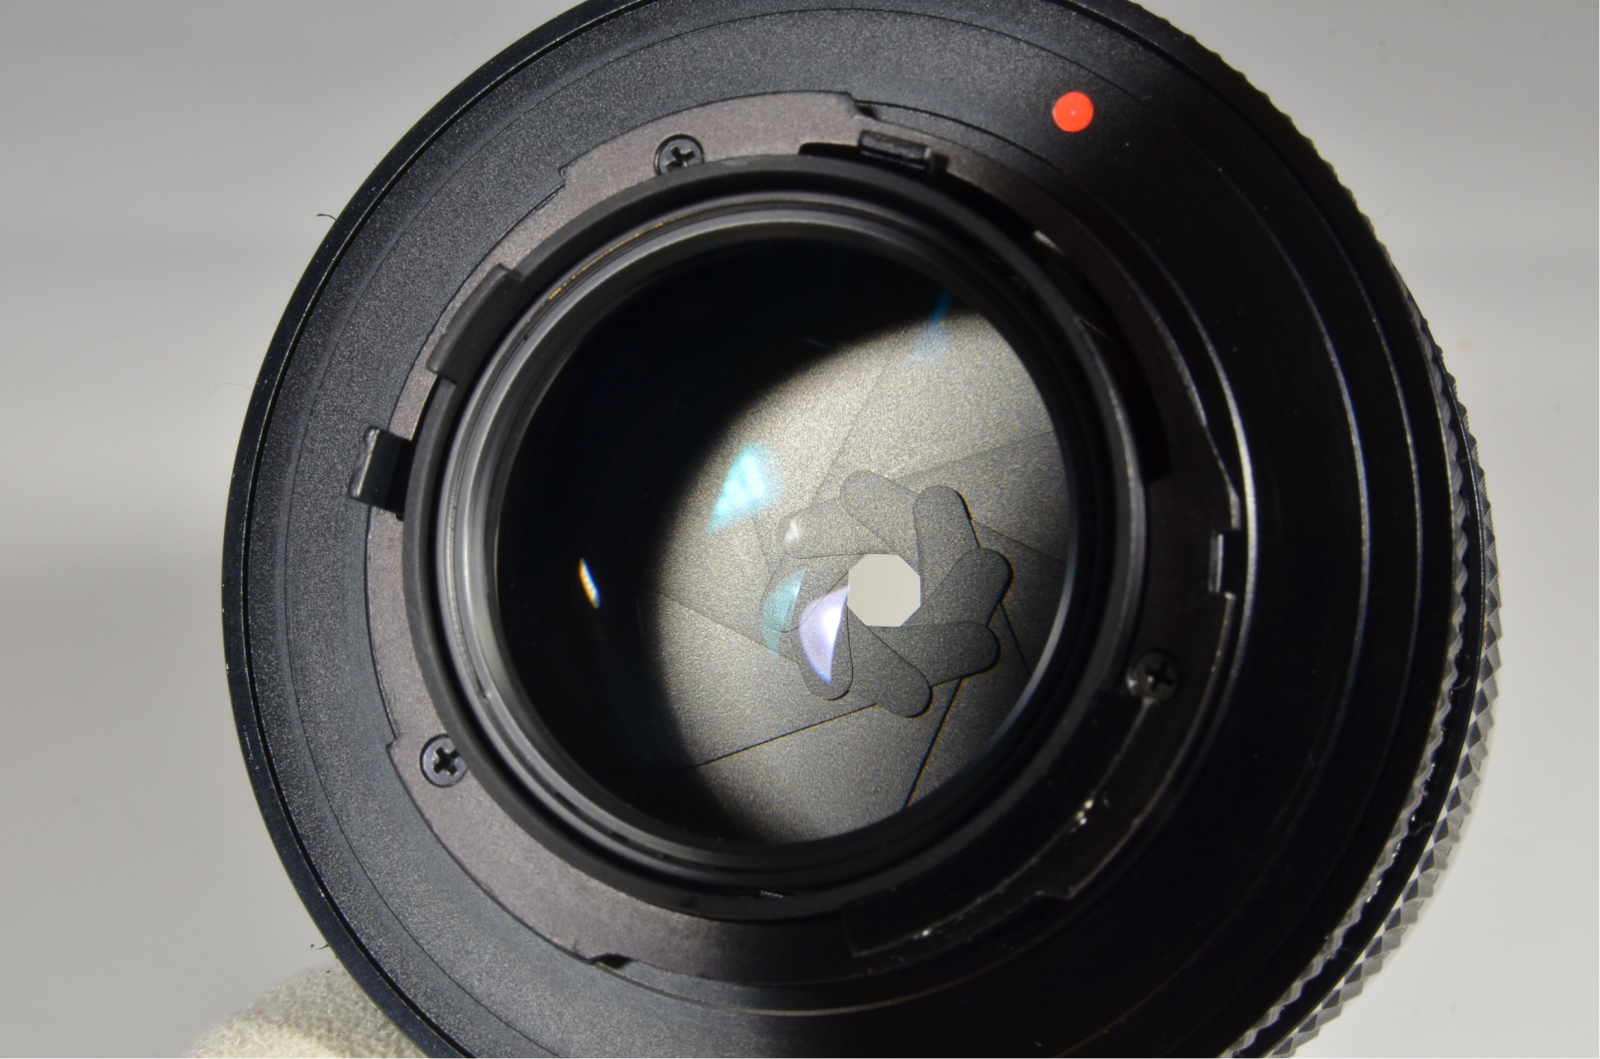 contax carl zeiss planar t* 85mm f1.4 aeg